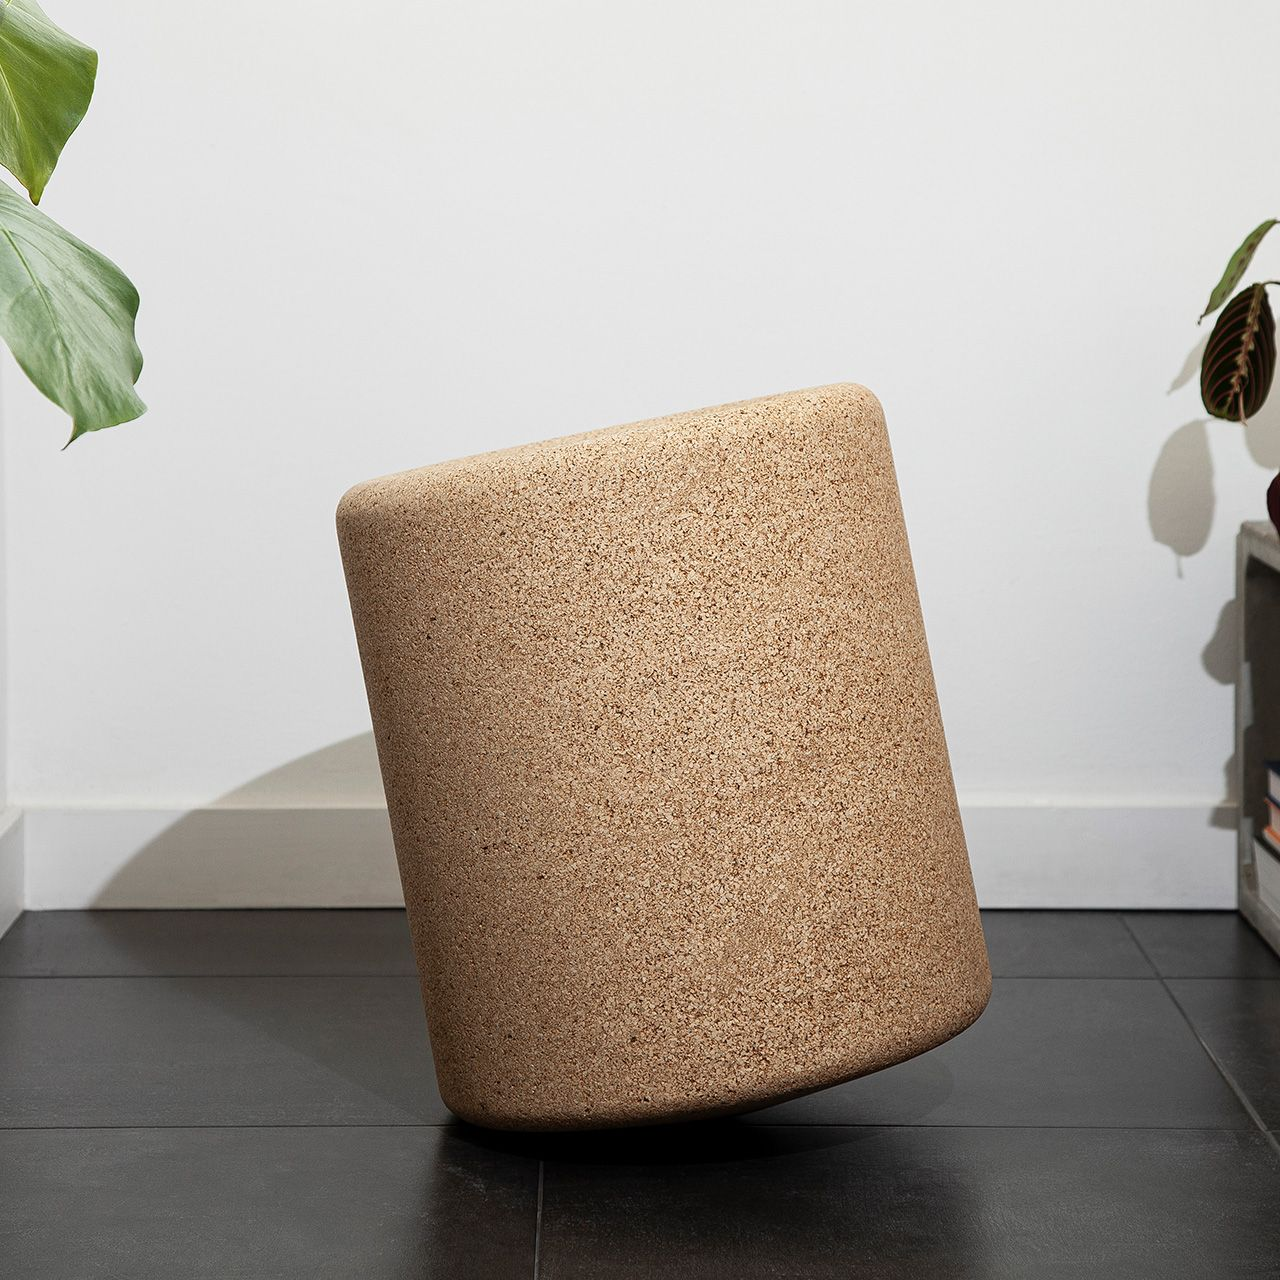 Ylin stool